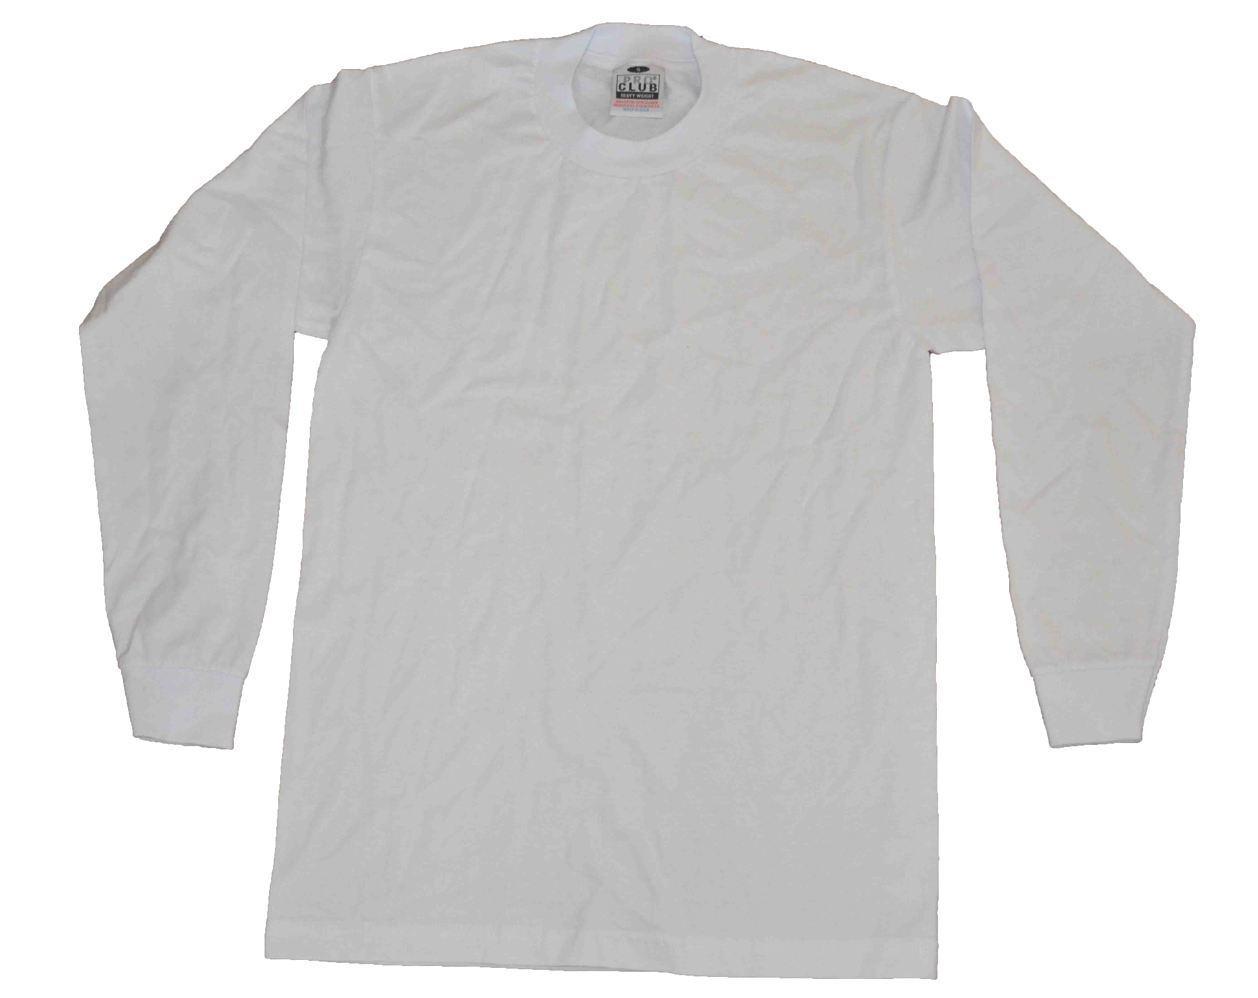 Pro Club Heavyweight T-shirt 100% Cotton-WHITE-2XLarge-LONG SLEEVE-Set of 6 pcs